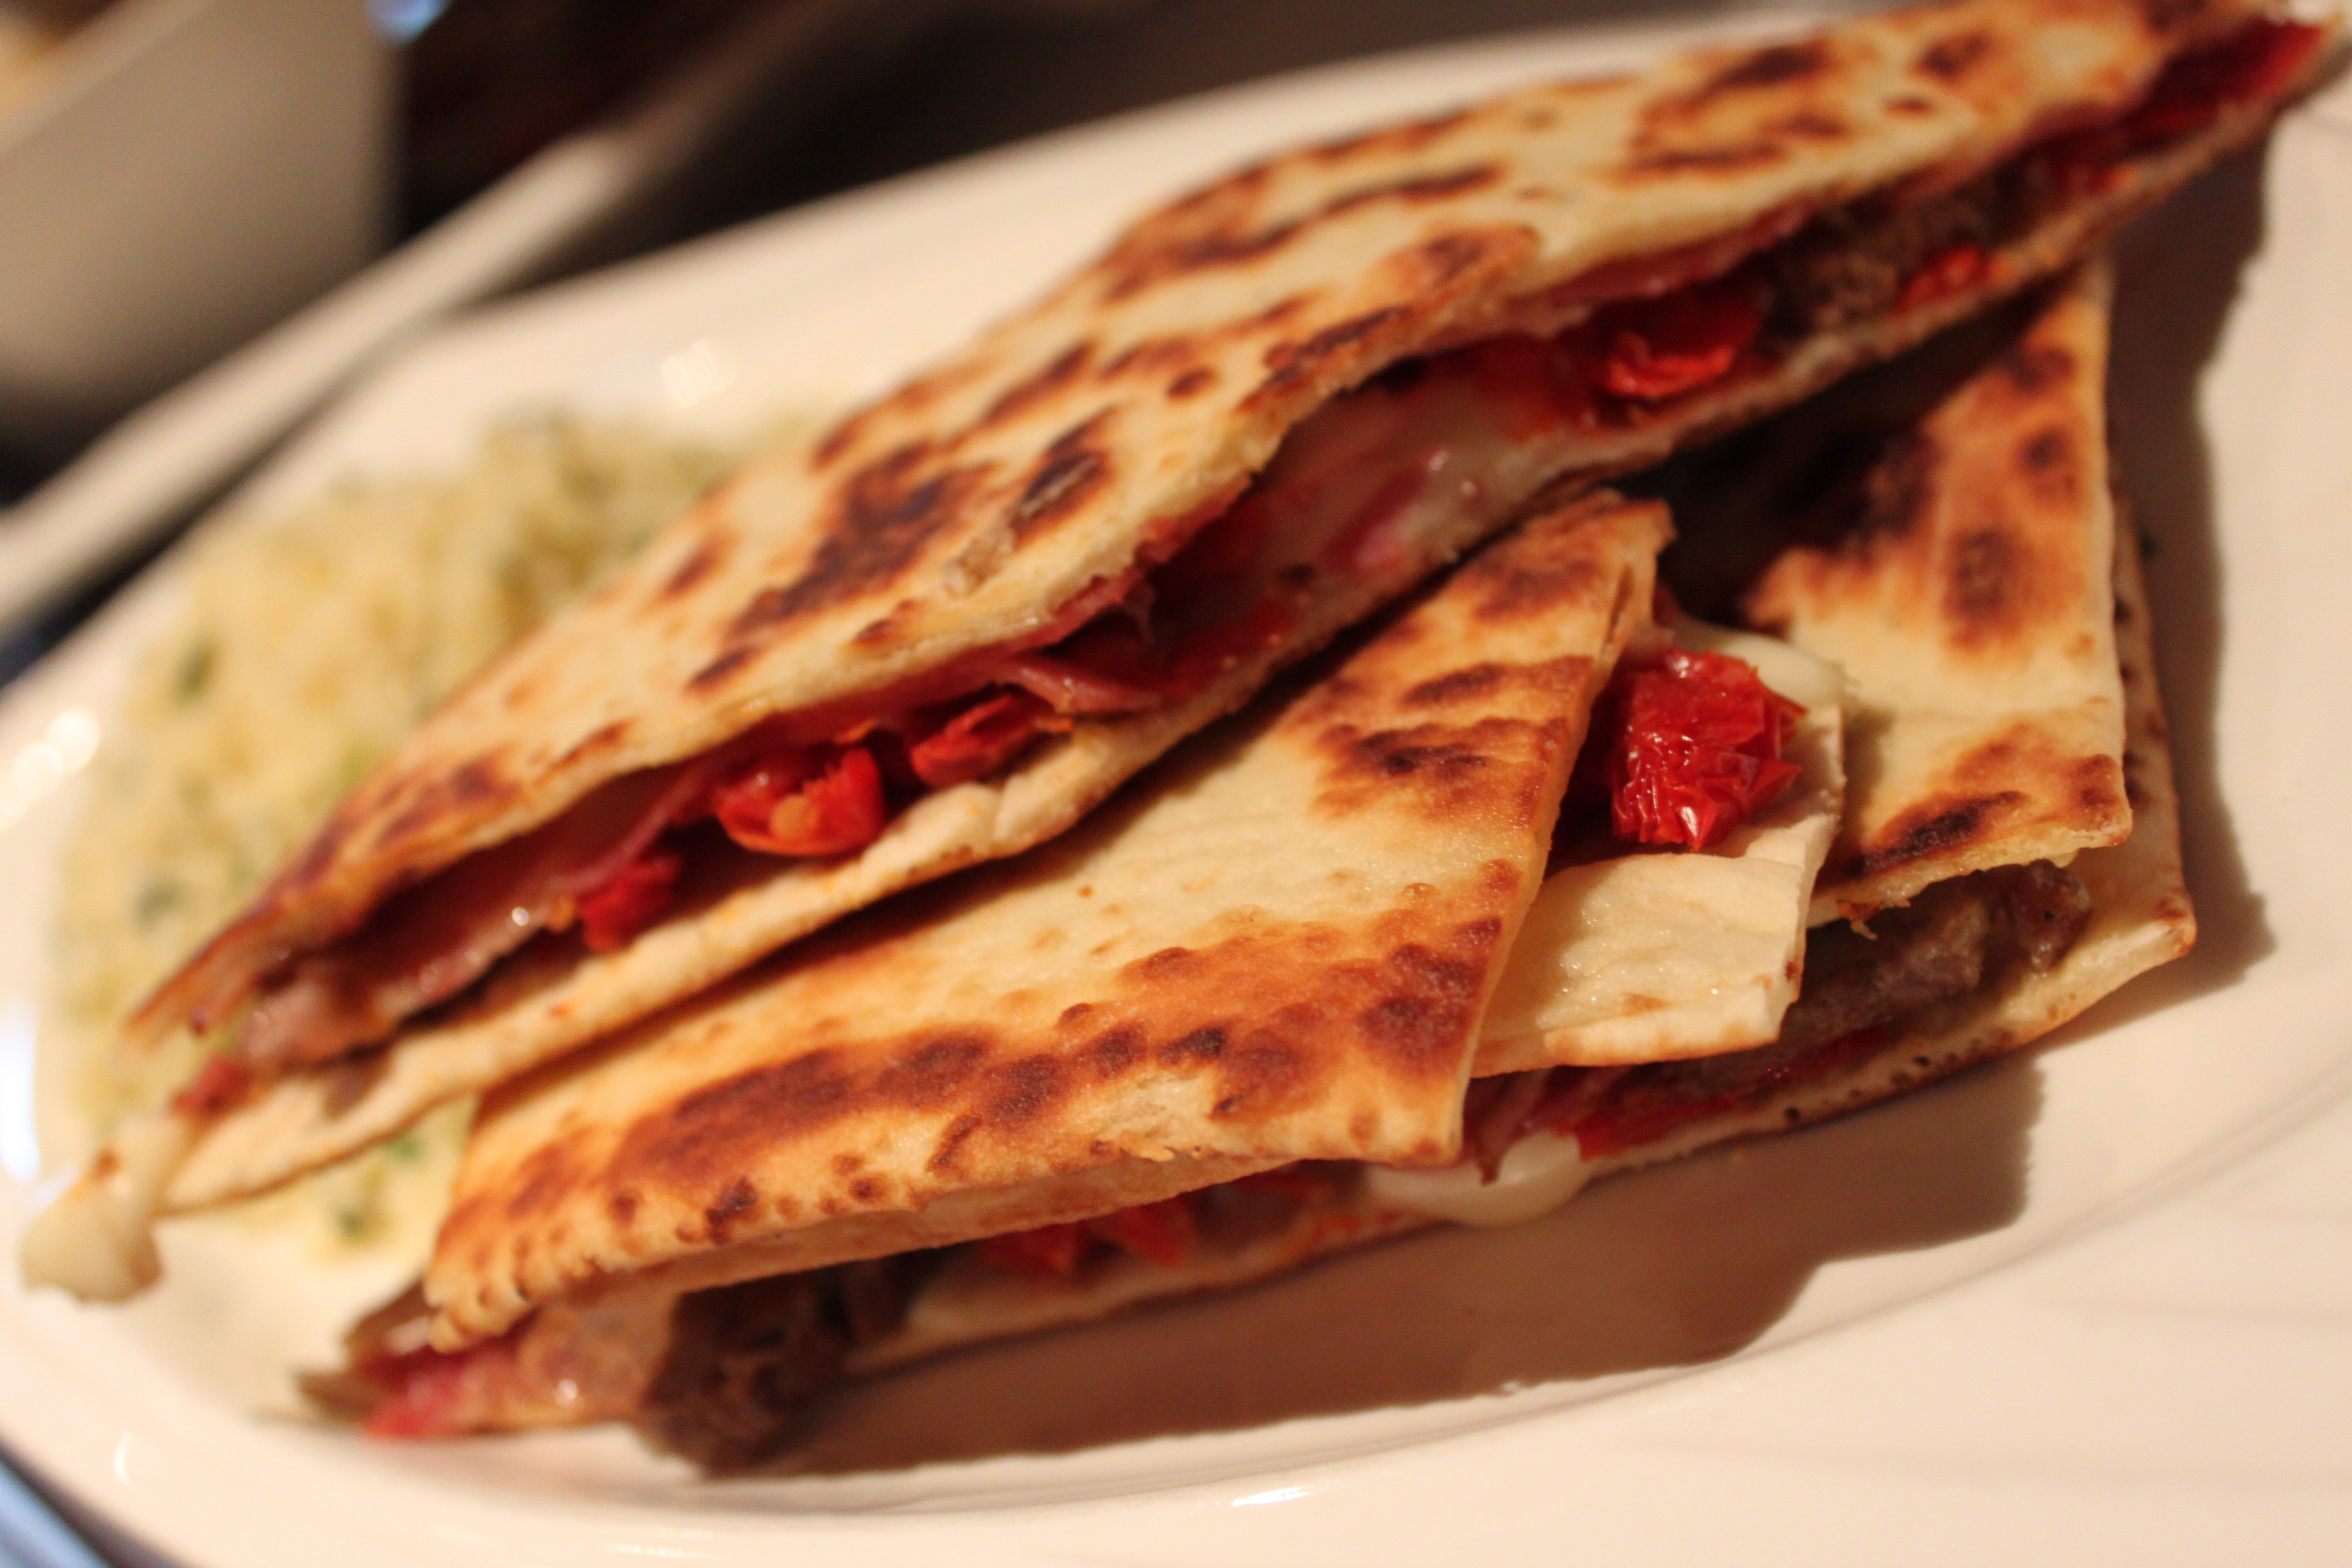 Spicy Italian salami and house smoked sausage with fresh mozzarella ...